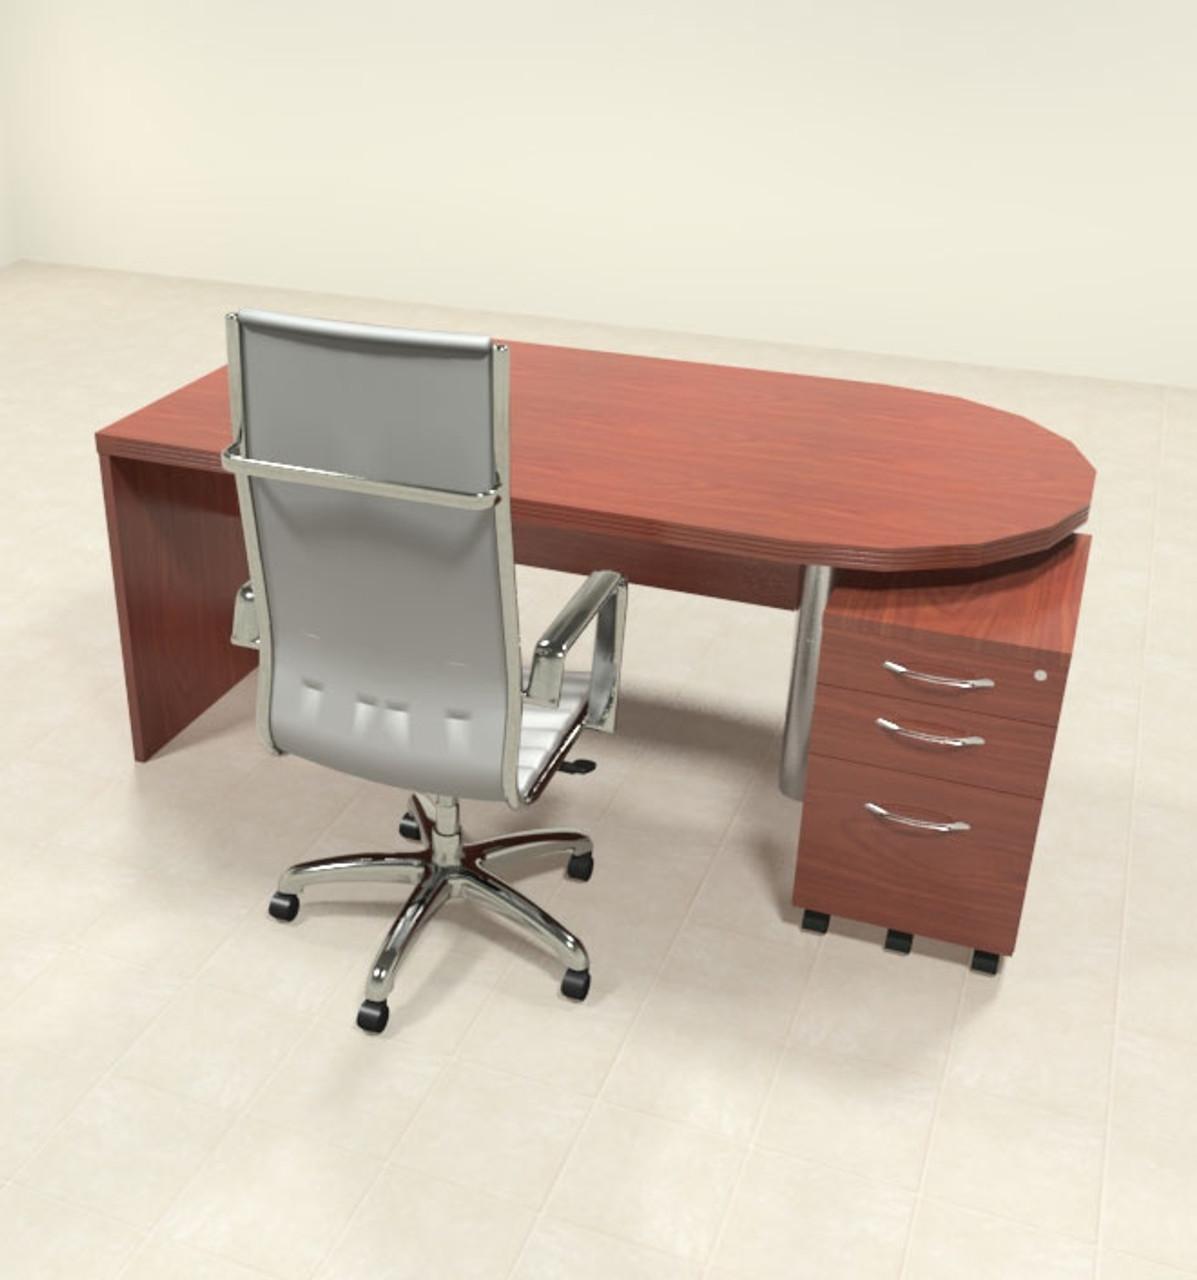 2pc Modern Contemporary Executive Office Desk Set, #RO-ABD-D2